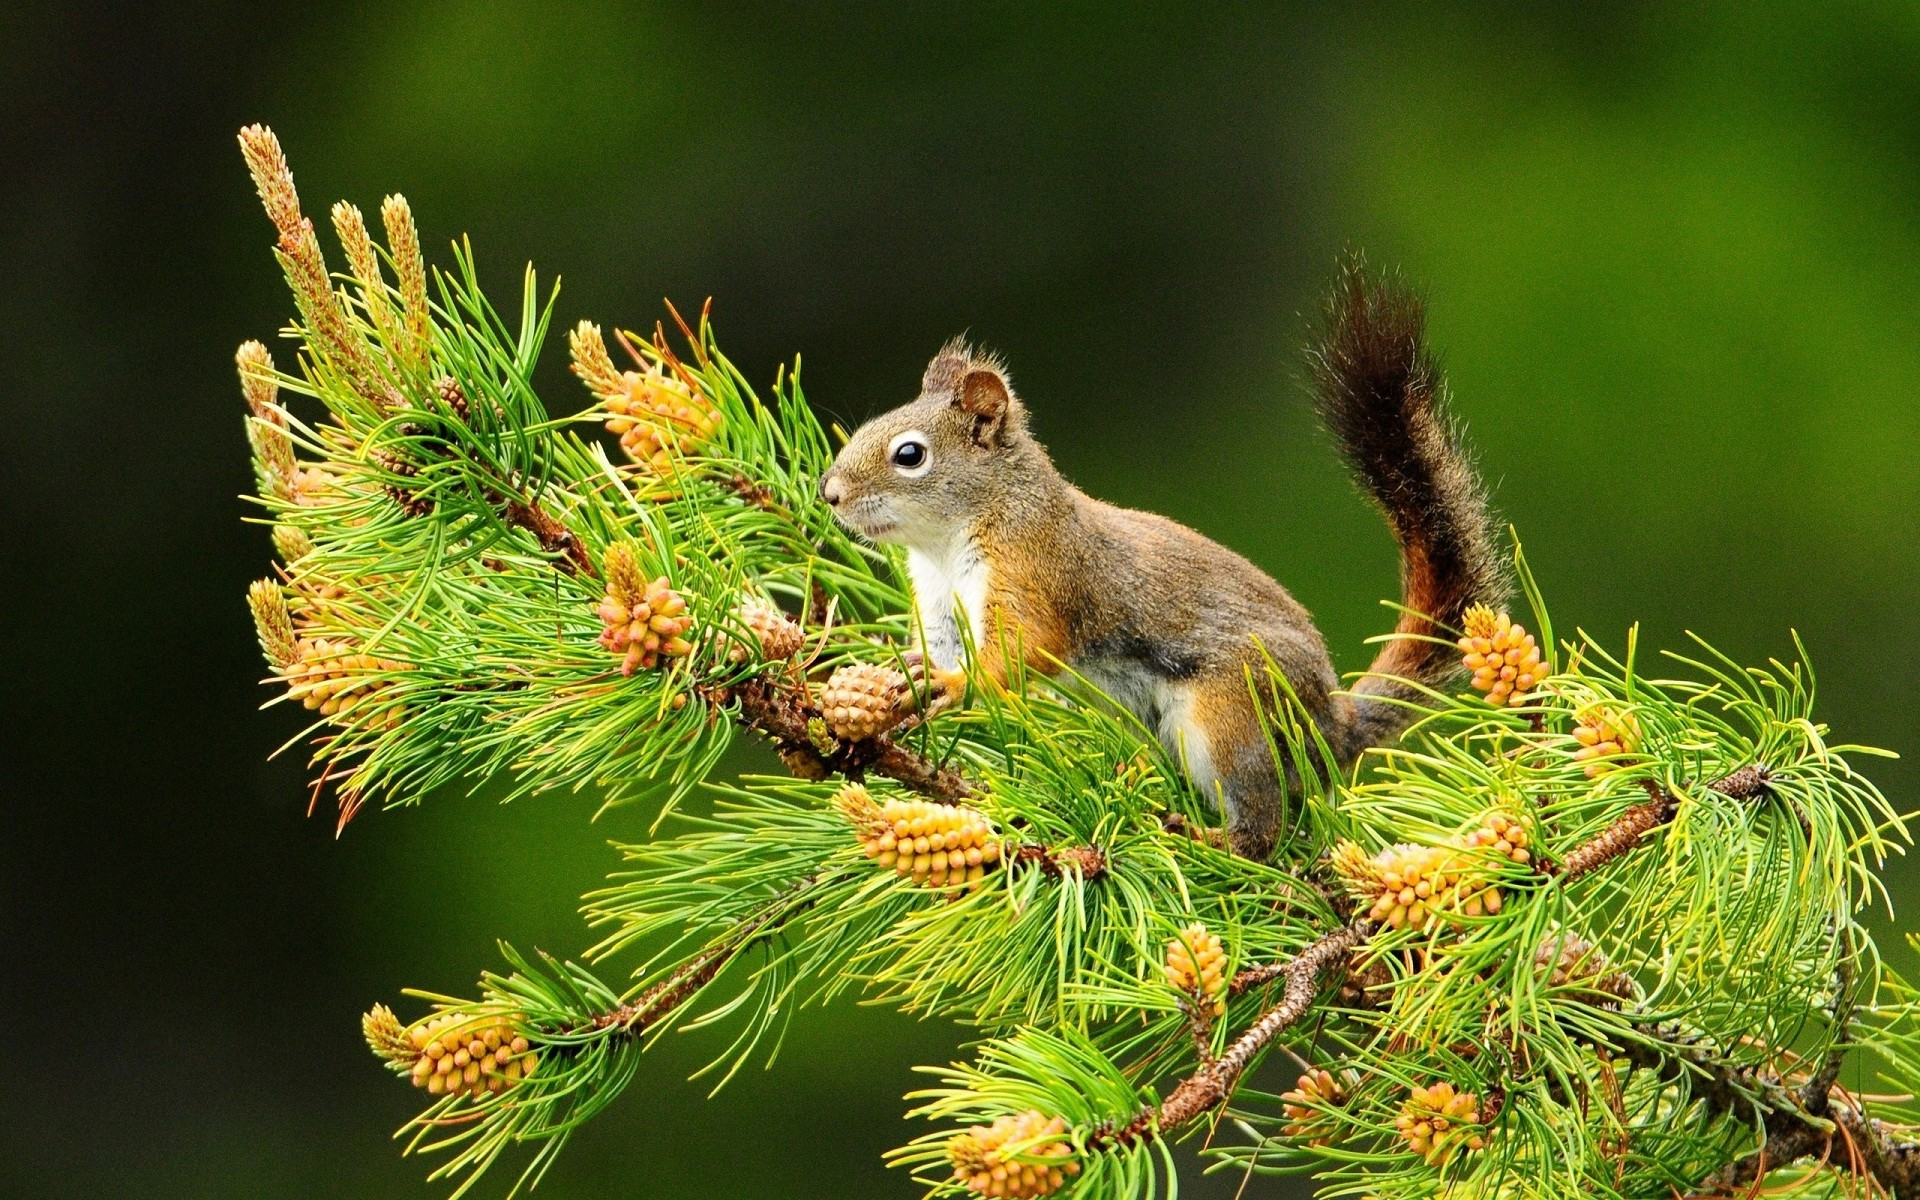 Cute butterfly nice HD wide wallpaper | Squirrel cute animals wallpaper |  HD Wallpapers Rocks